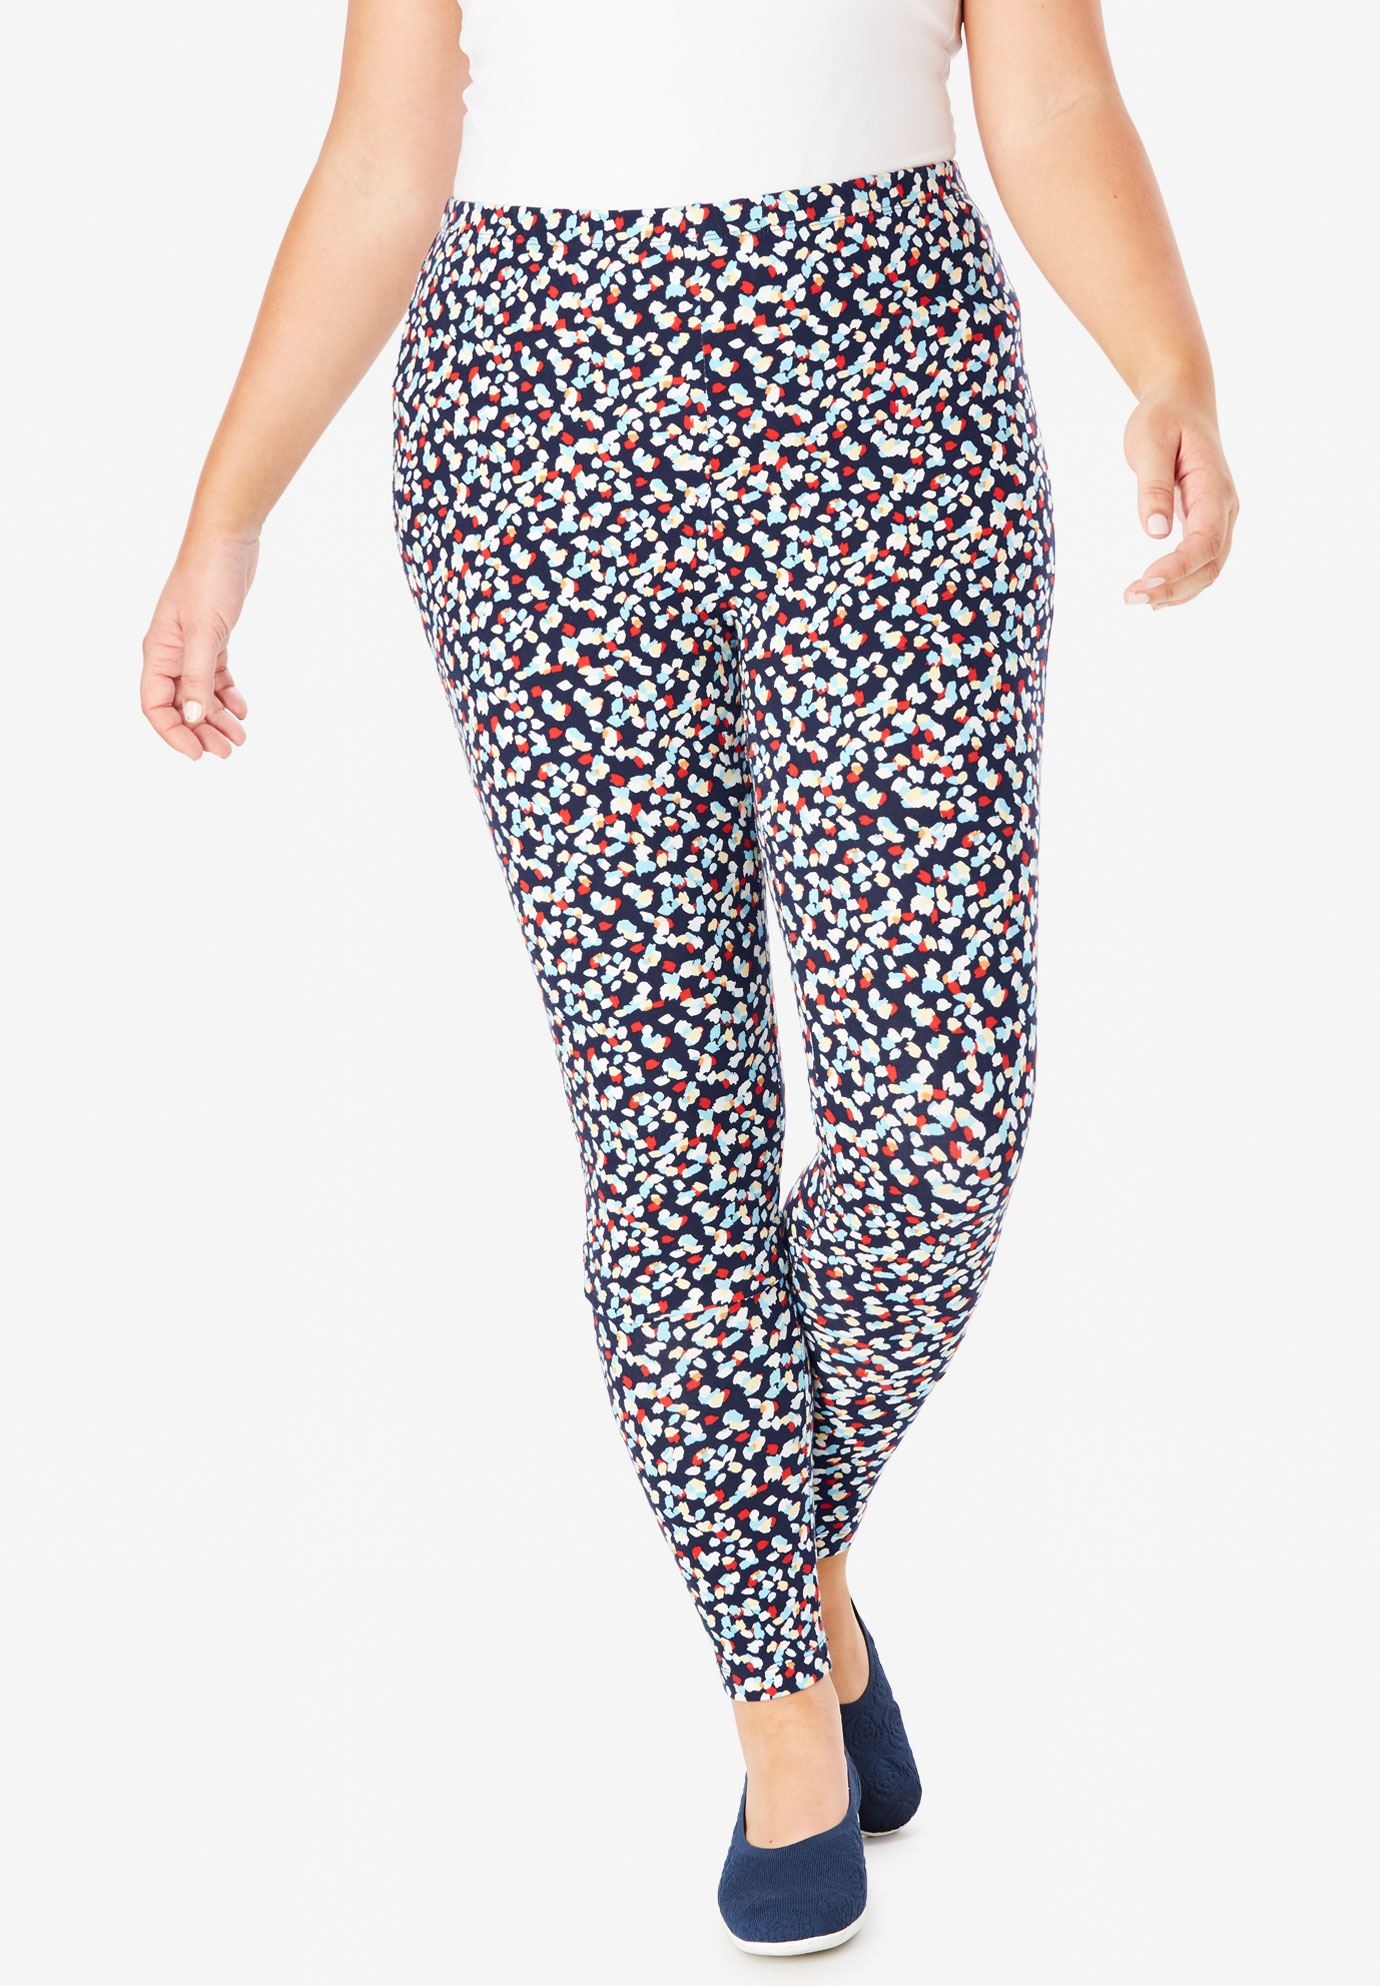 Plus Size Tall Stretch Cotton Printed Legging